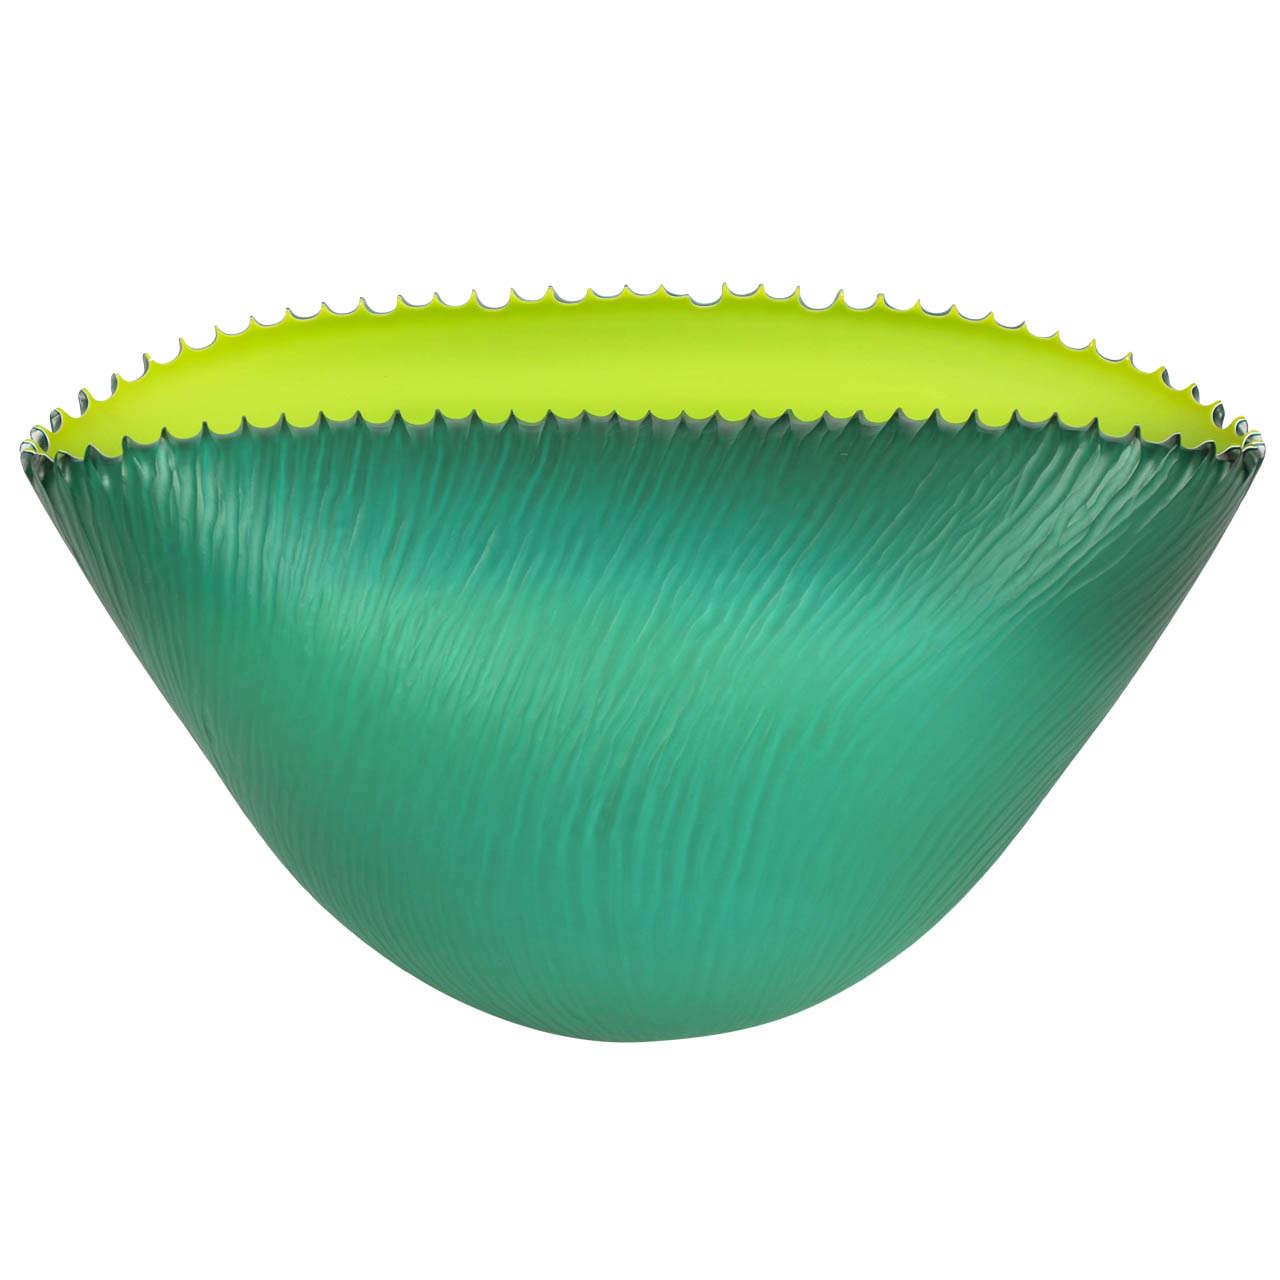 Fin Bowl by Laura Birdsall